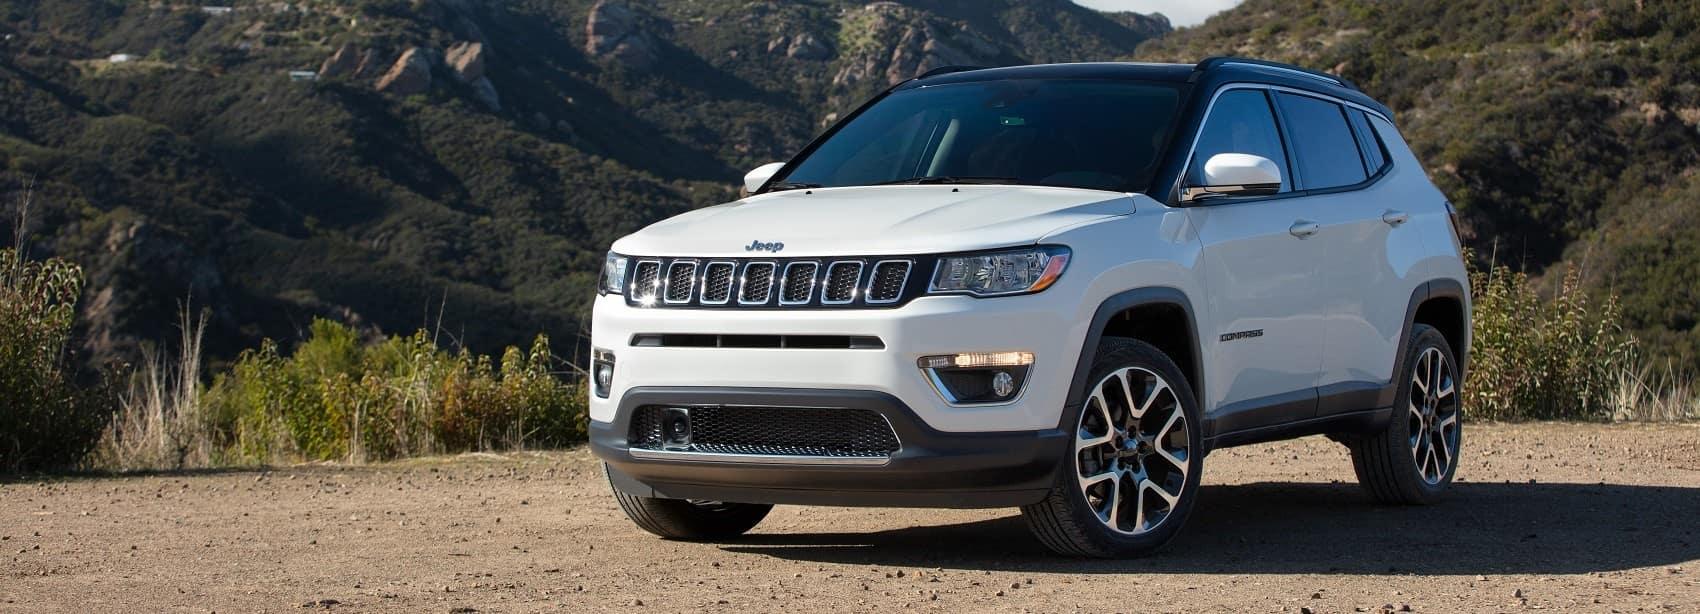 Jeep Compass Lease Deals